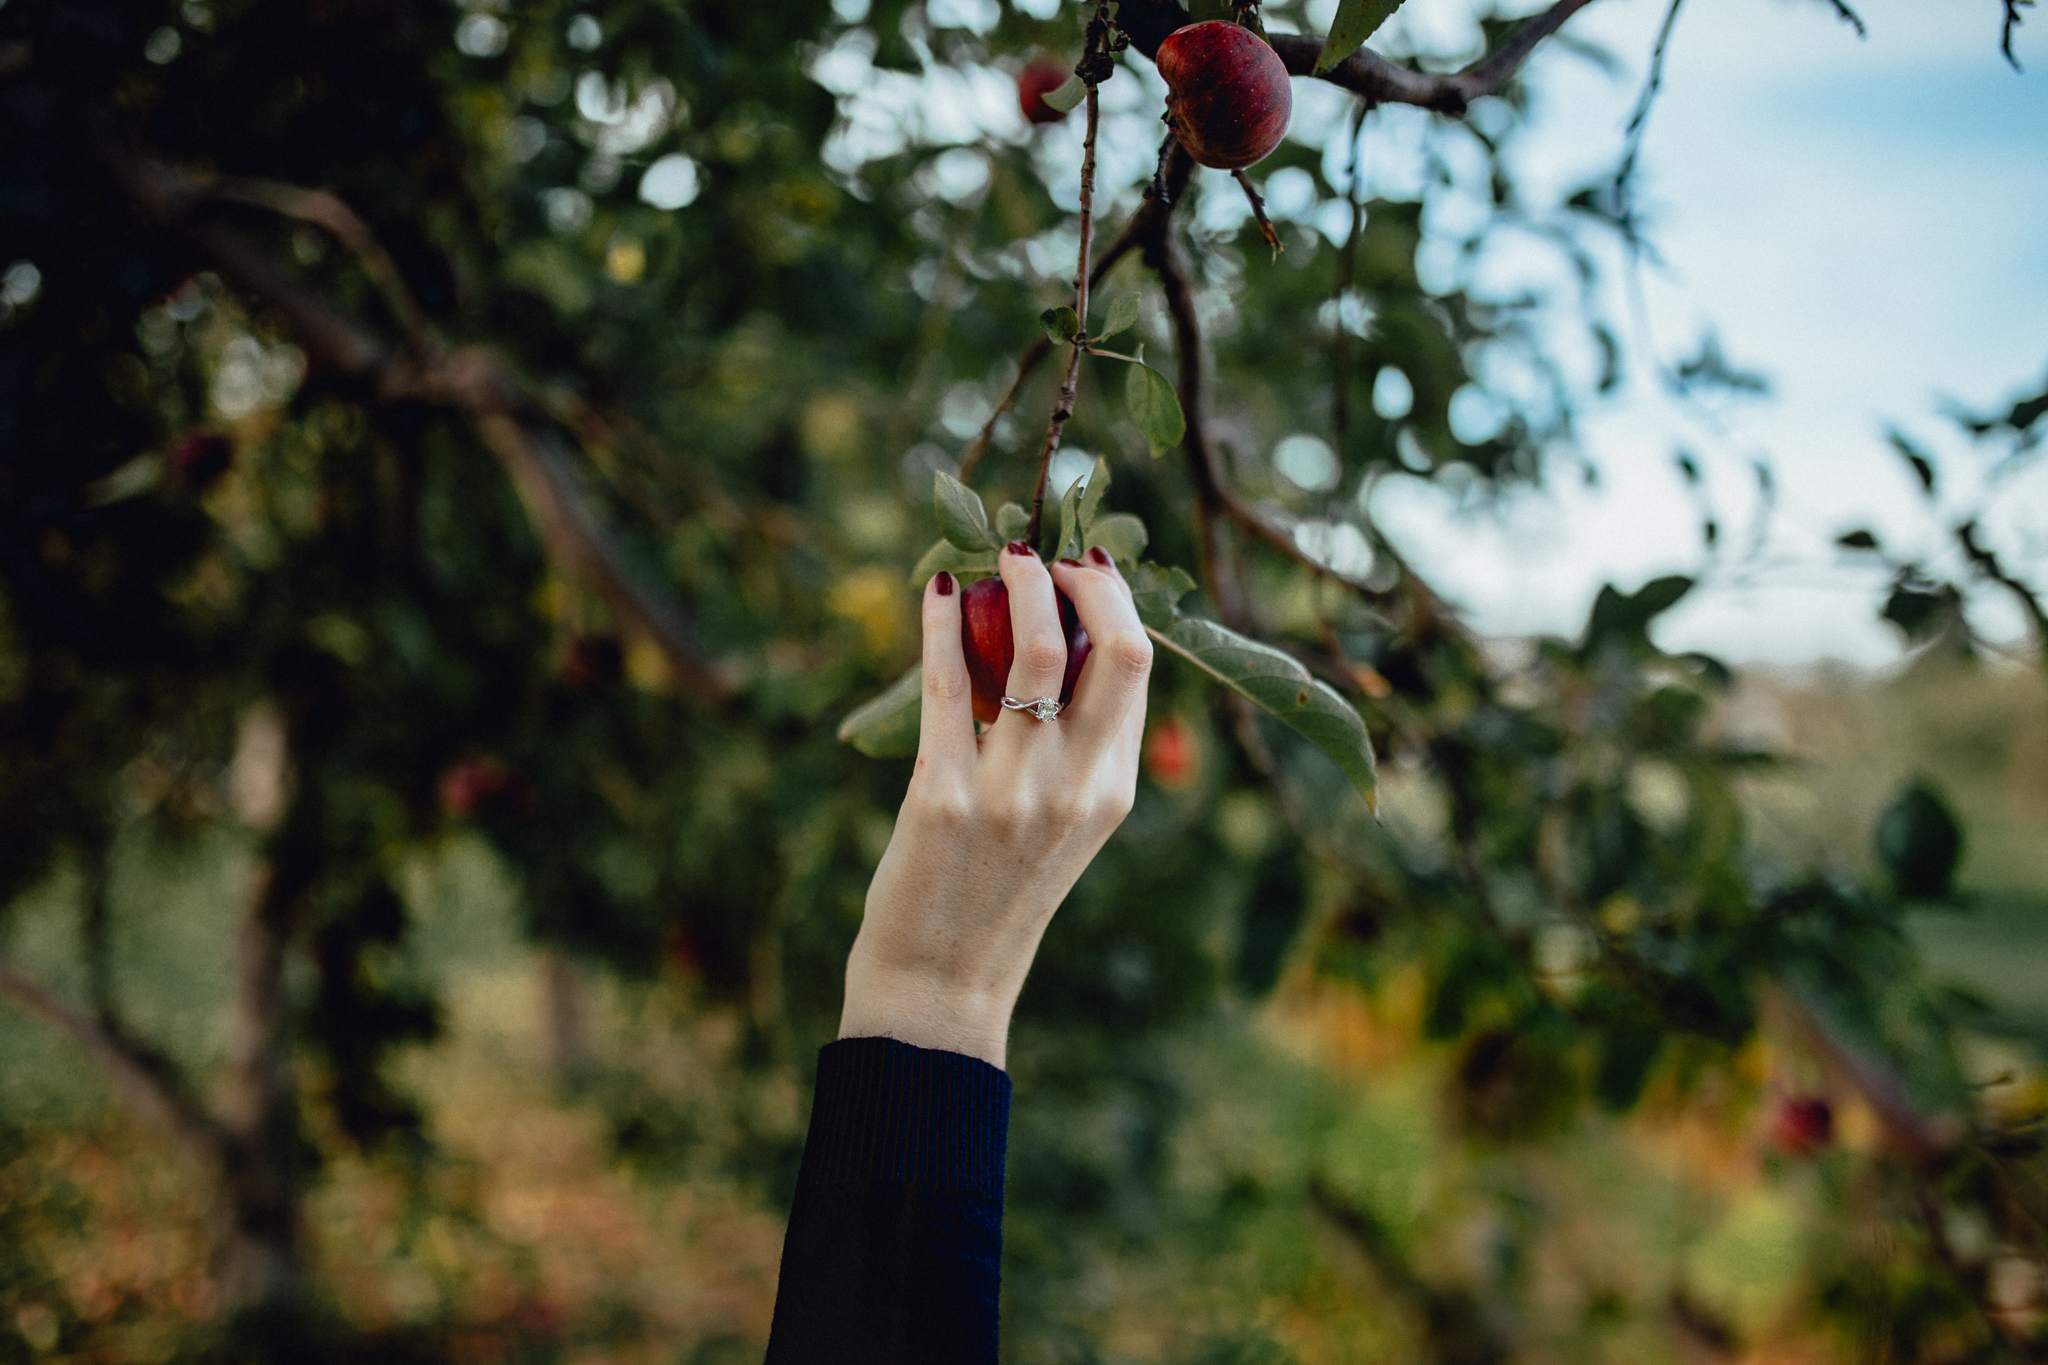 bride-picking-apple-from-tree.jpg